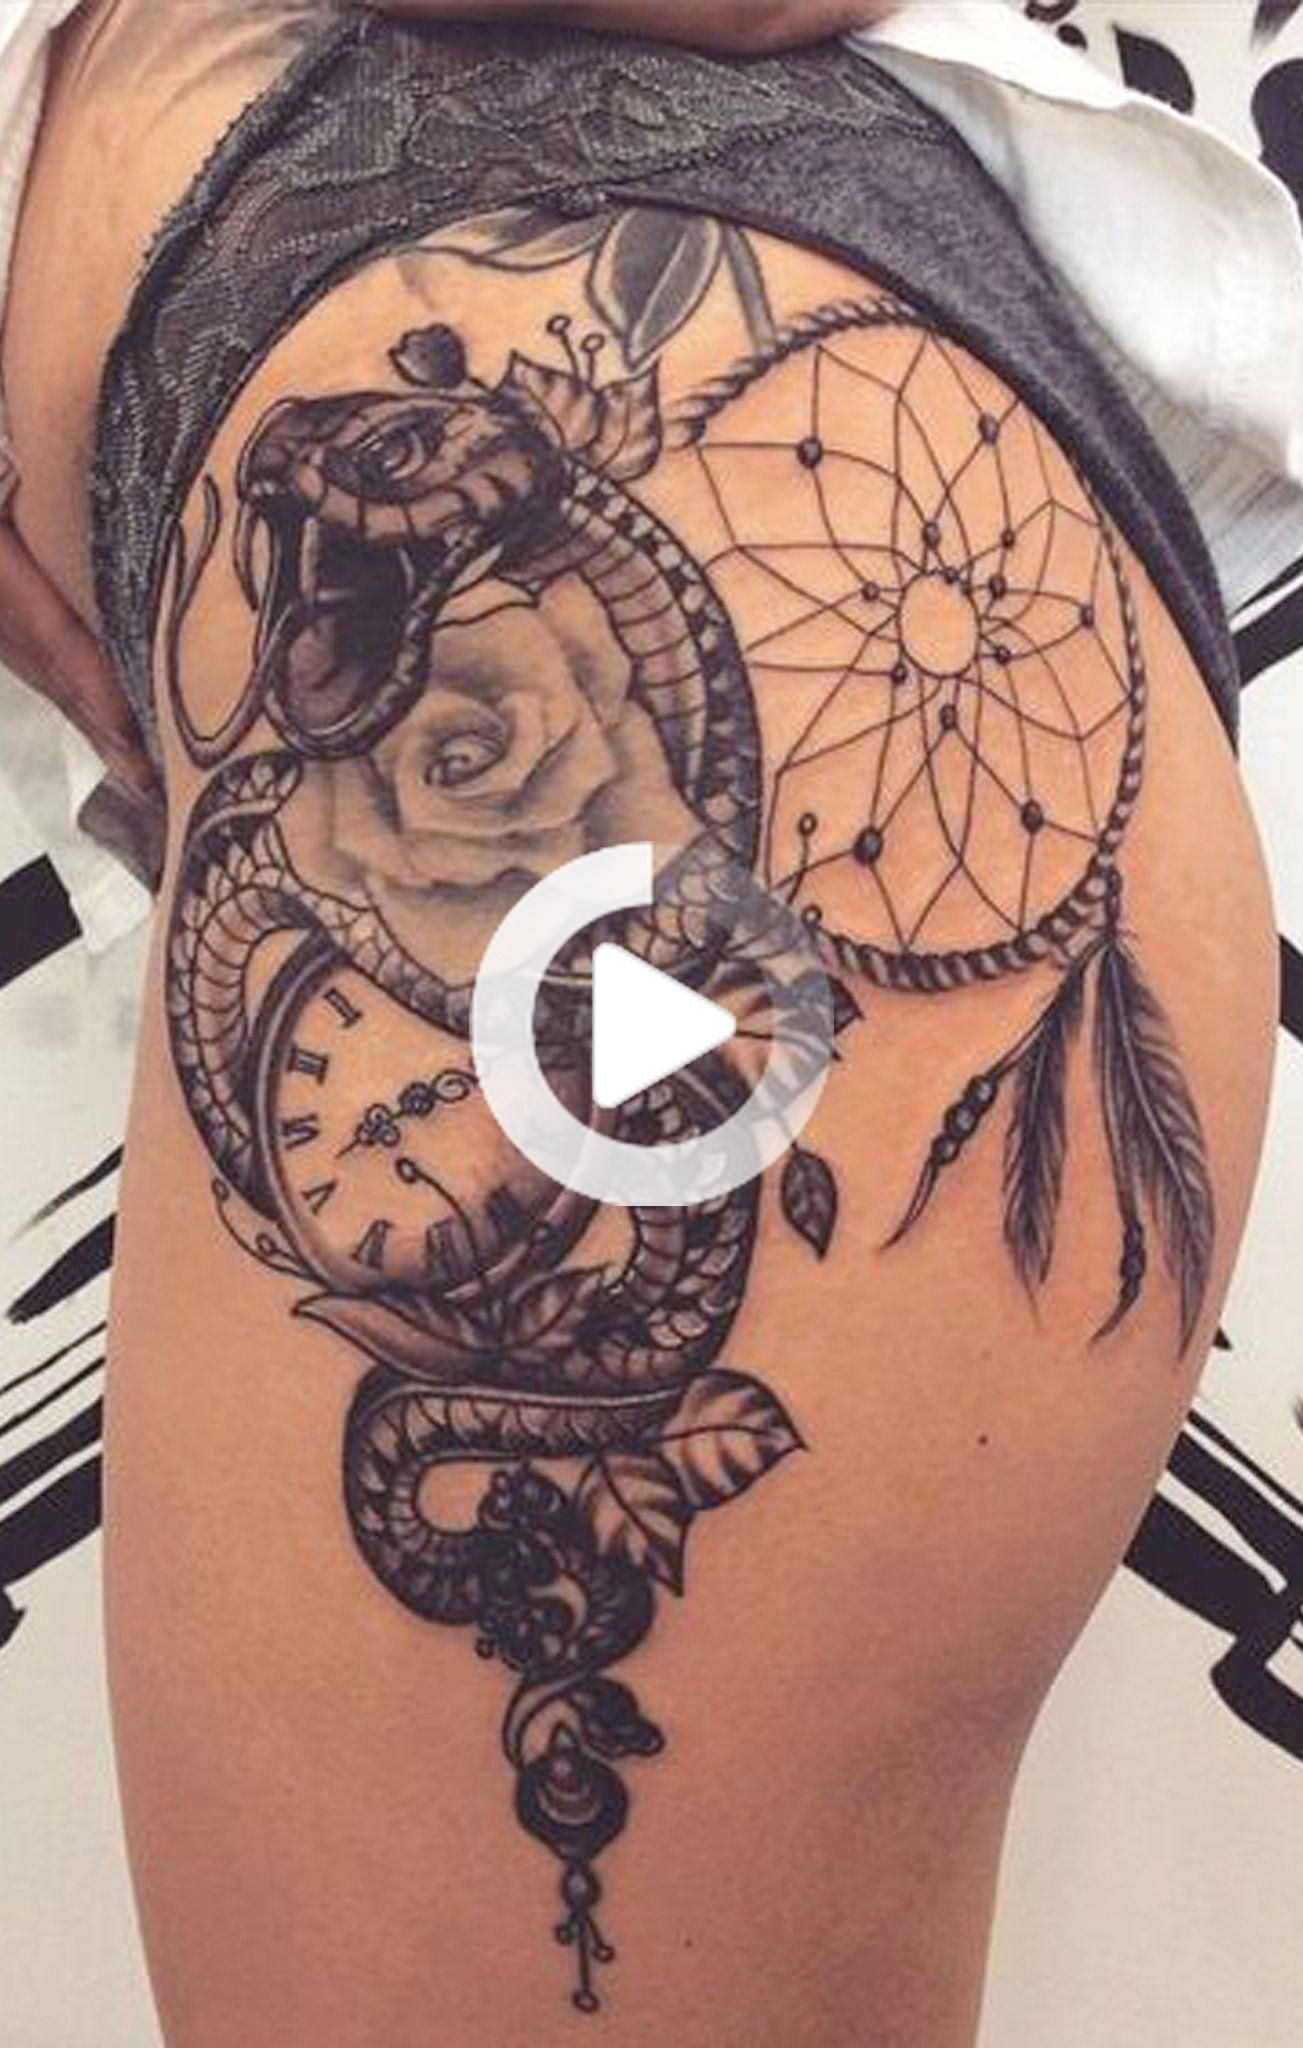 Hip Design Tattoo In 2020 Hip Tattoos Women Hip Tattoo Designs Thigh Tattoos Women